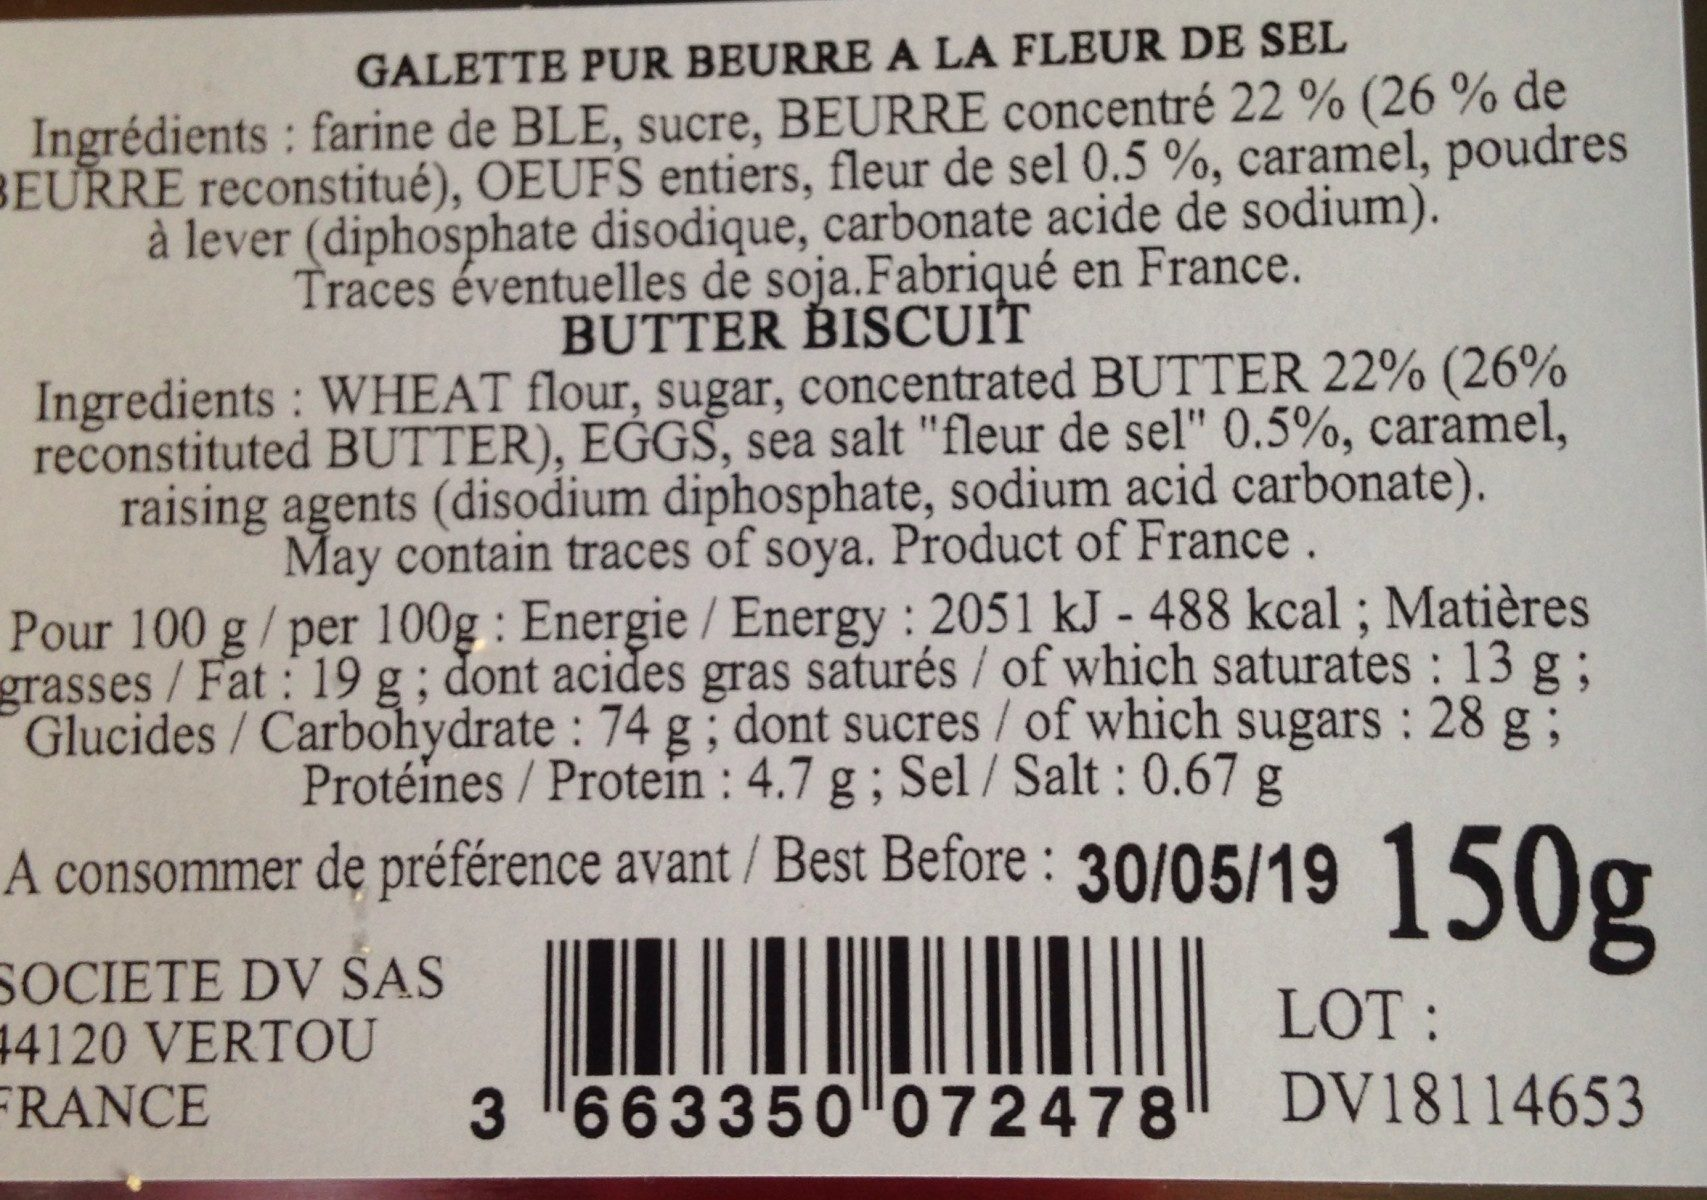 Galettes pur beurre - Ingrediënten